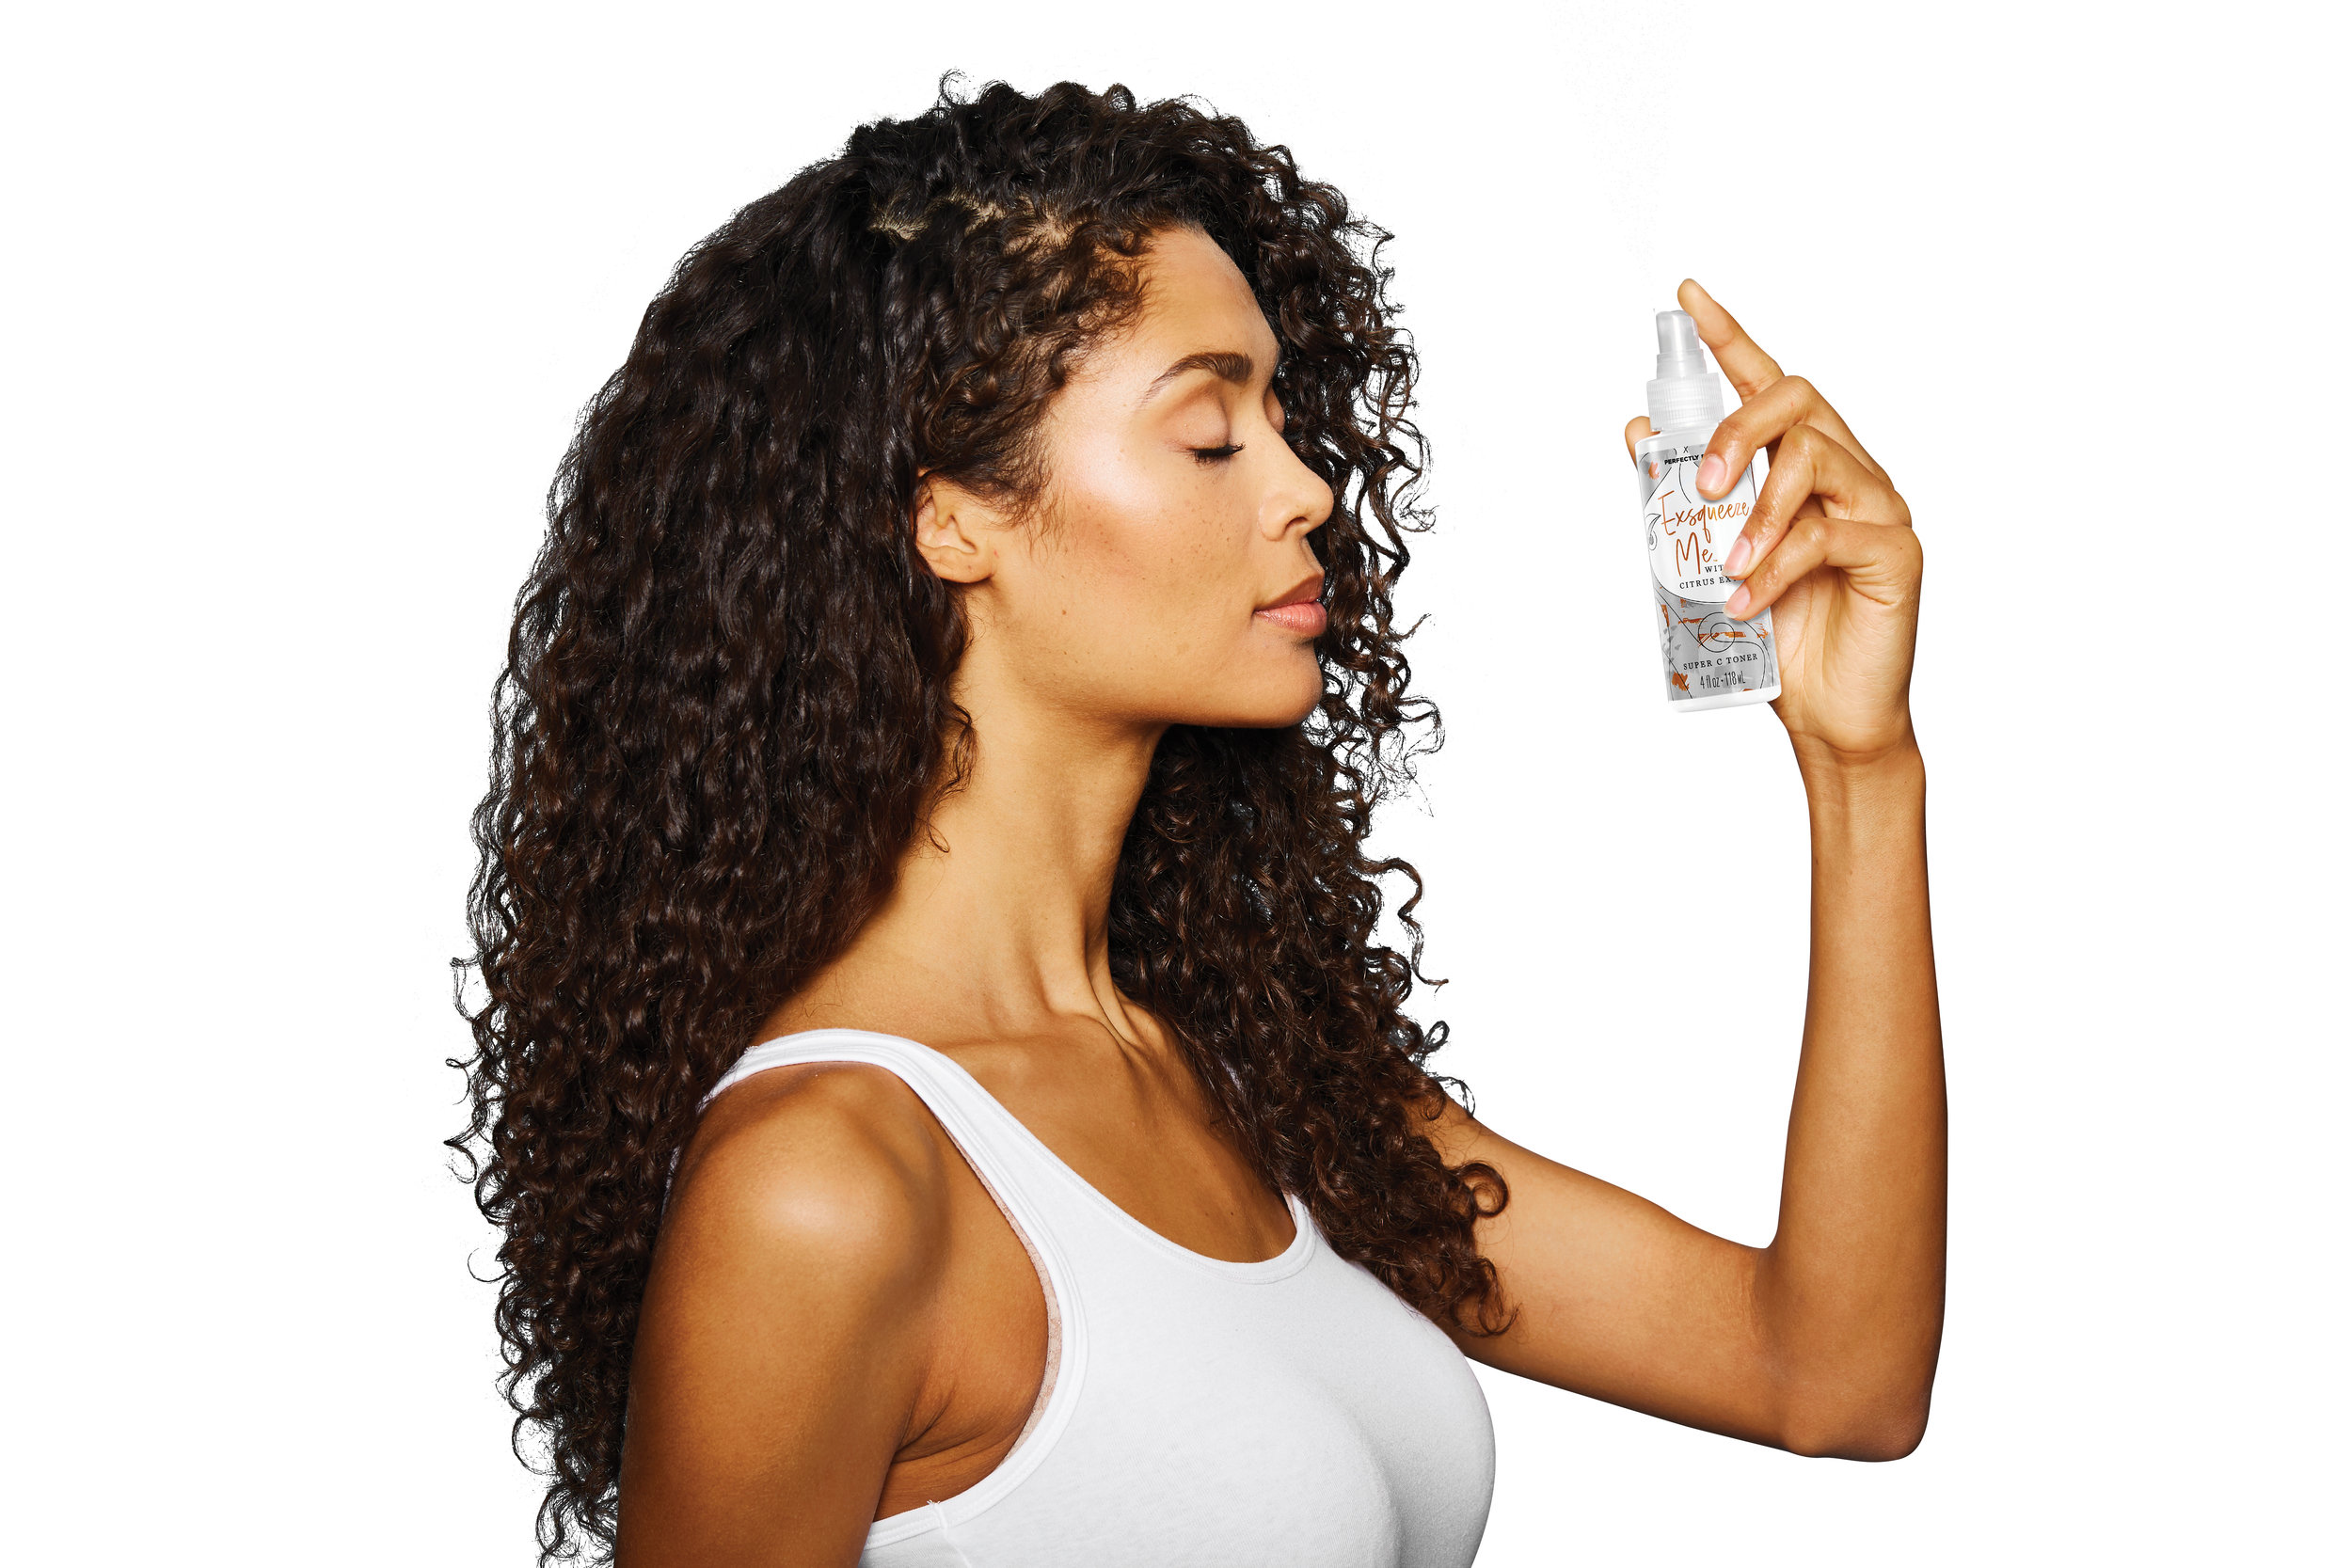 Perfectly Posh how to use a toner, Exsqueeze Me Super C Toner, spraying on toner, skin brightening toner